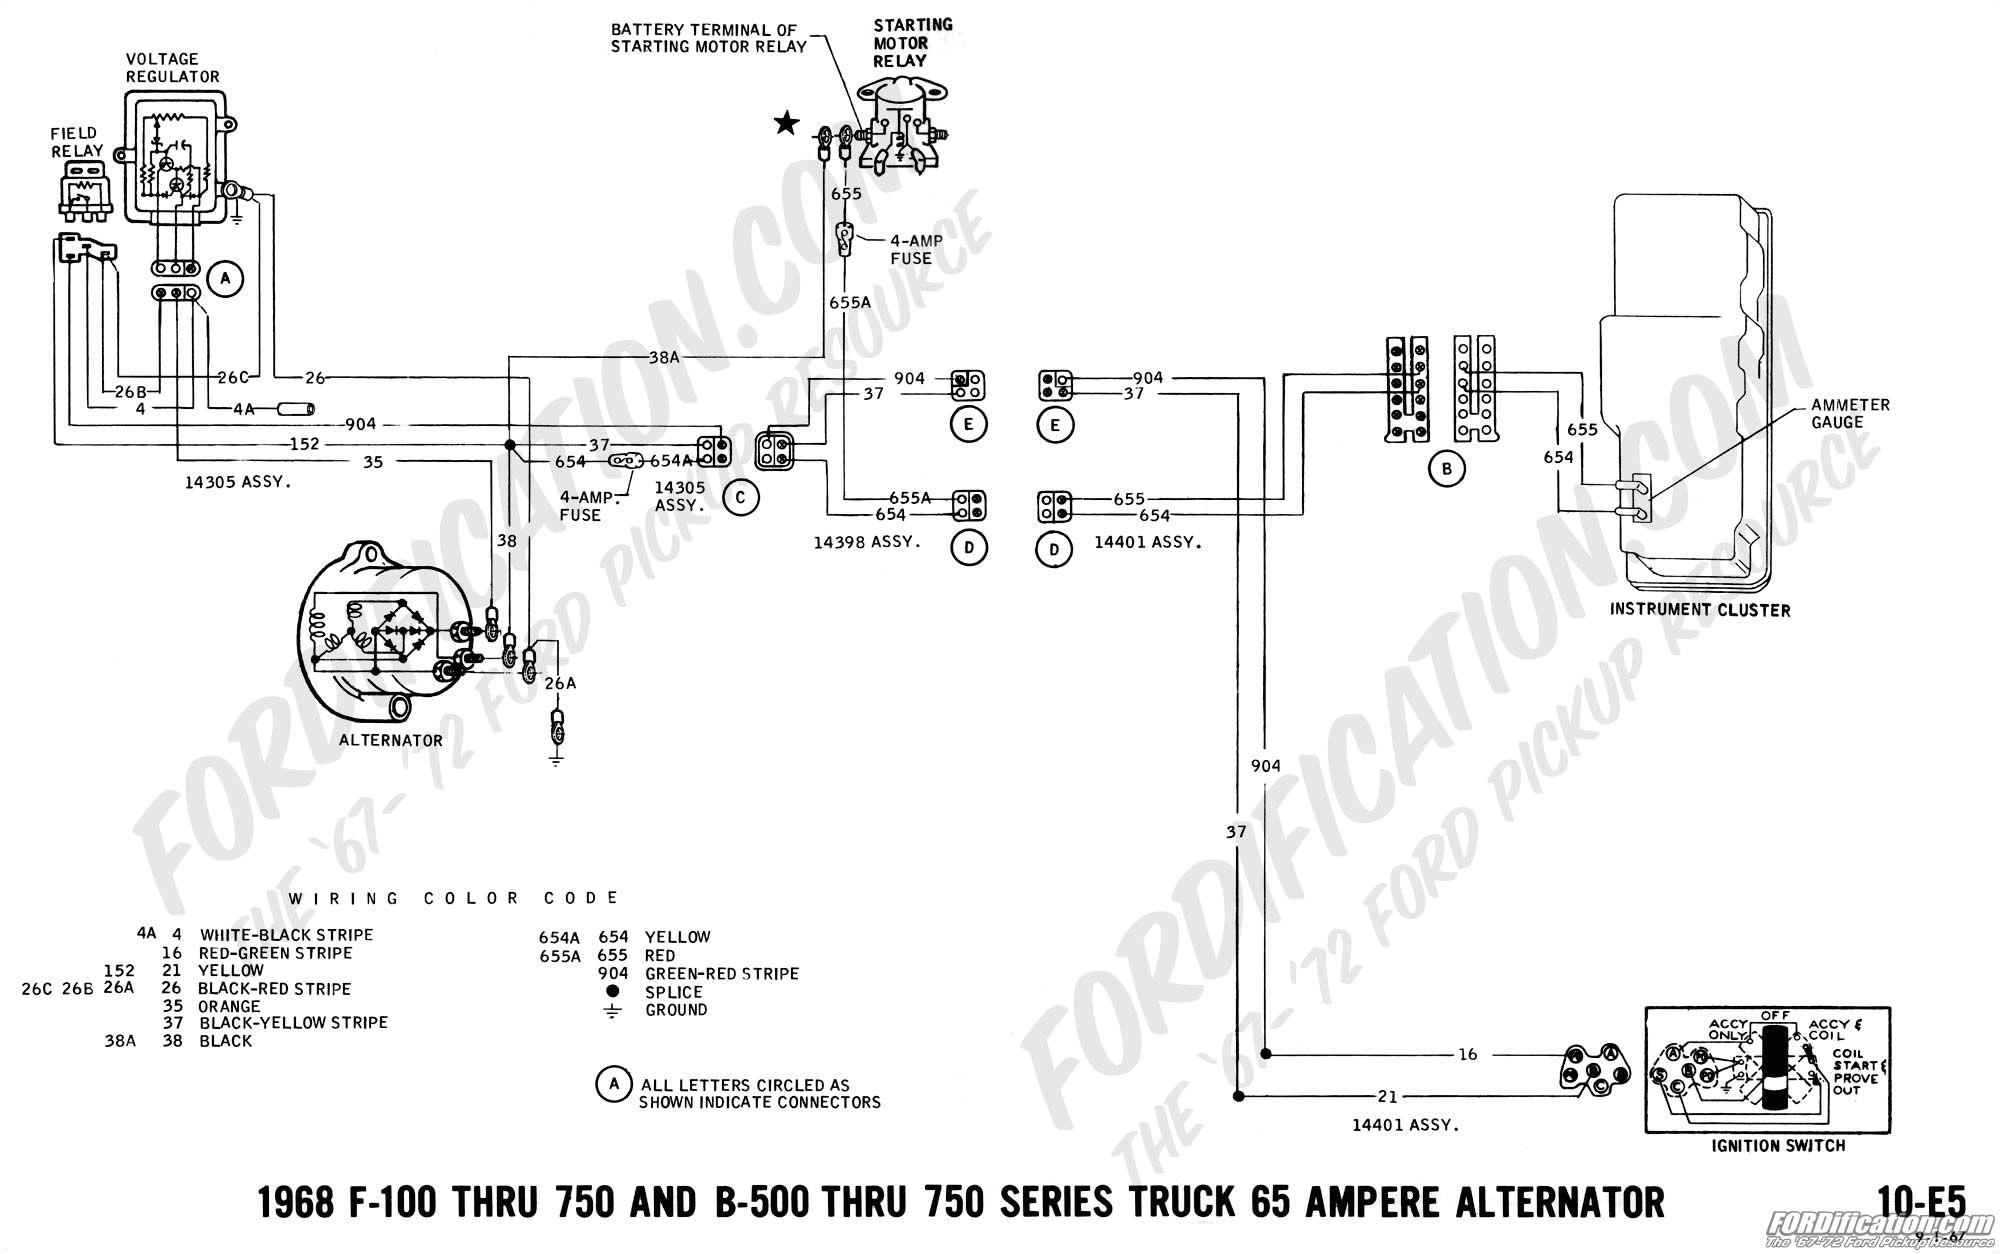 1978 ford voltage regulator wiring diagram